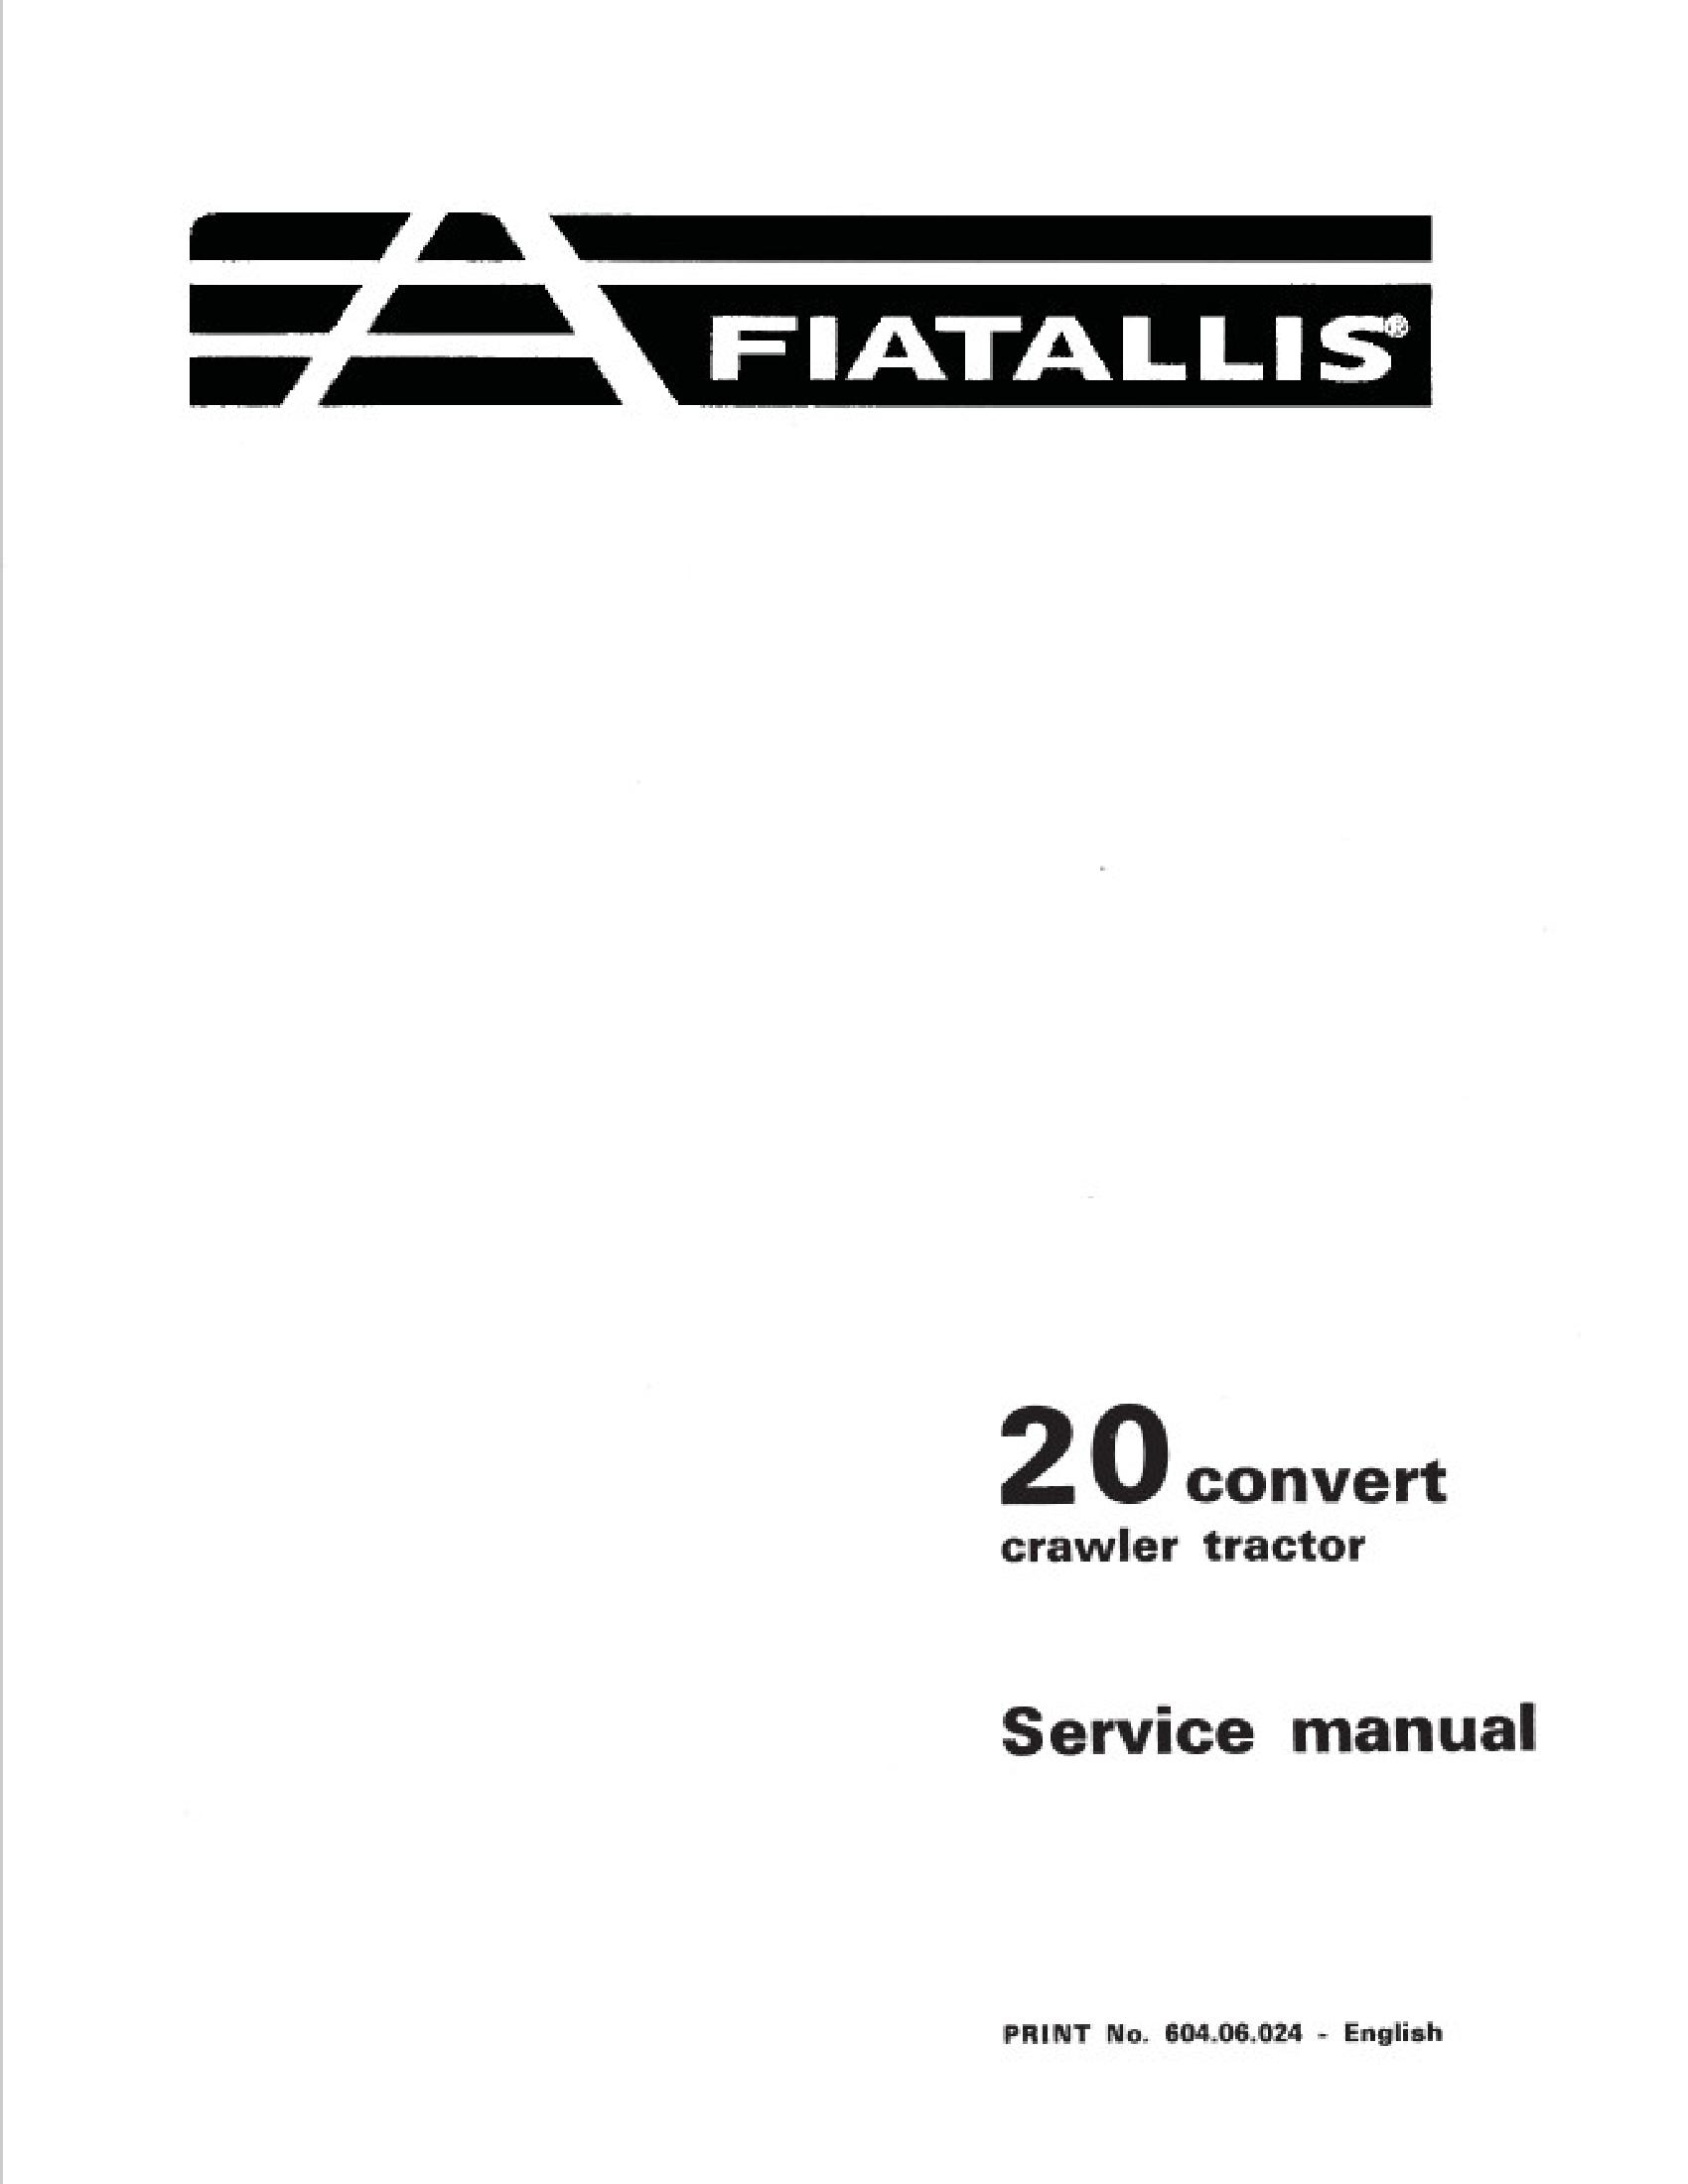 Fiat-Allis 20 Convert Crawler Tractor manual